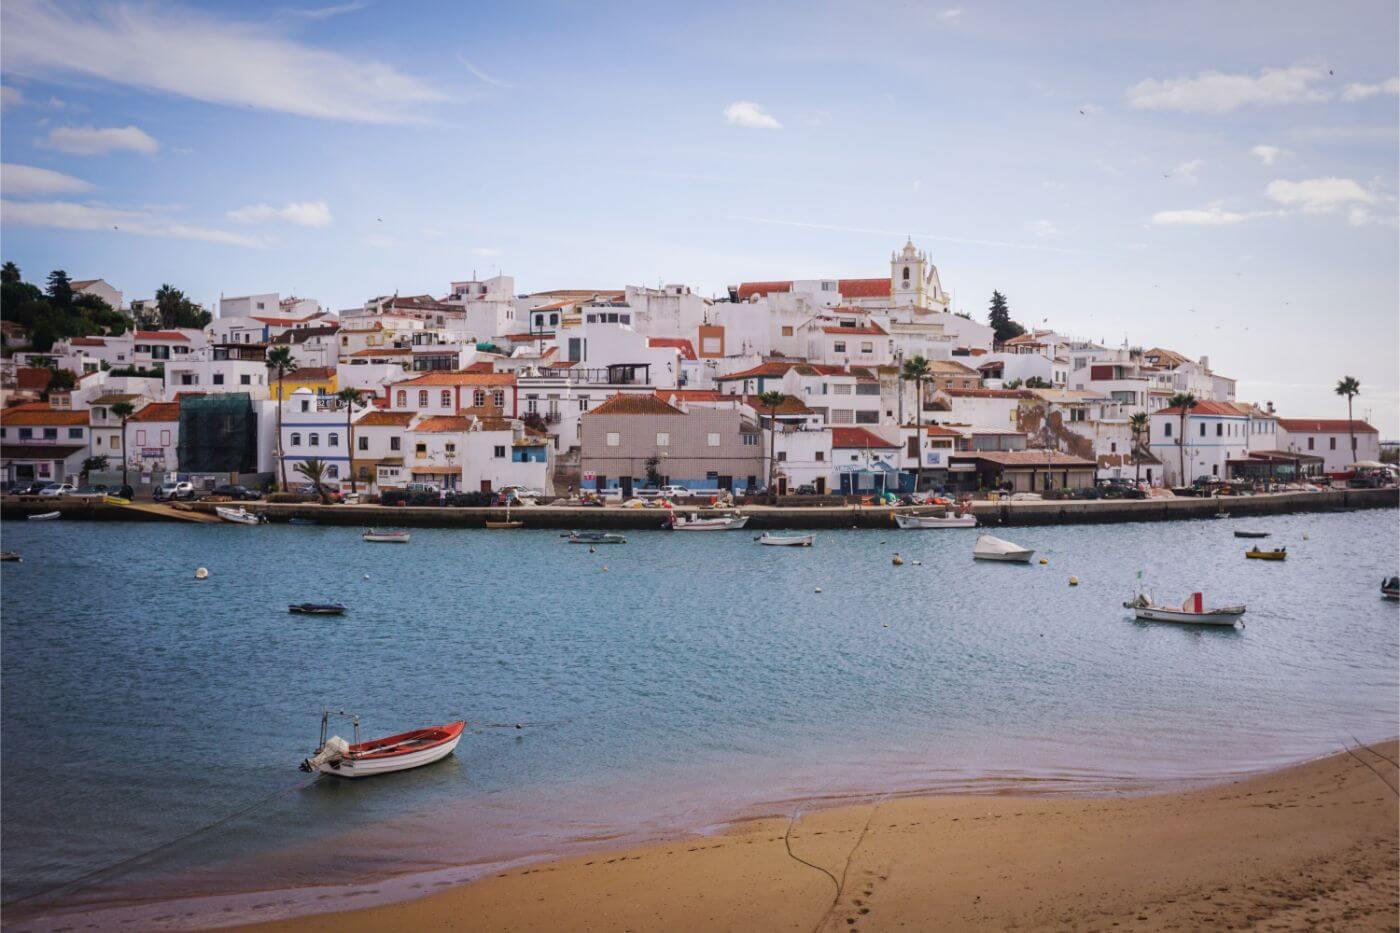 Ferragudo - Where to Stay in the Algarve, Portugal